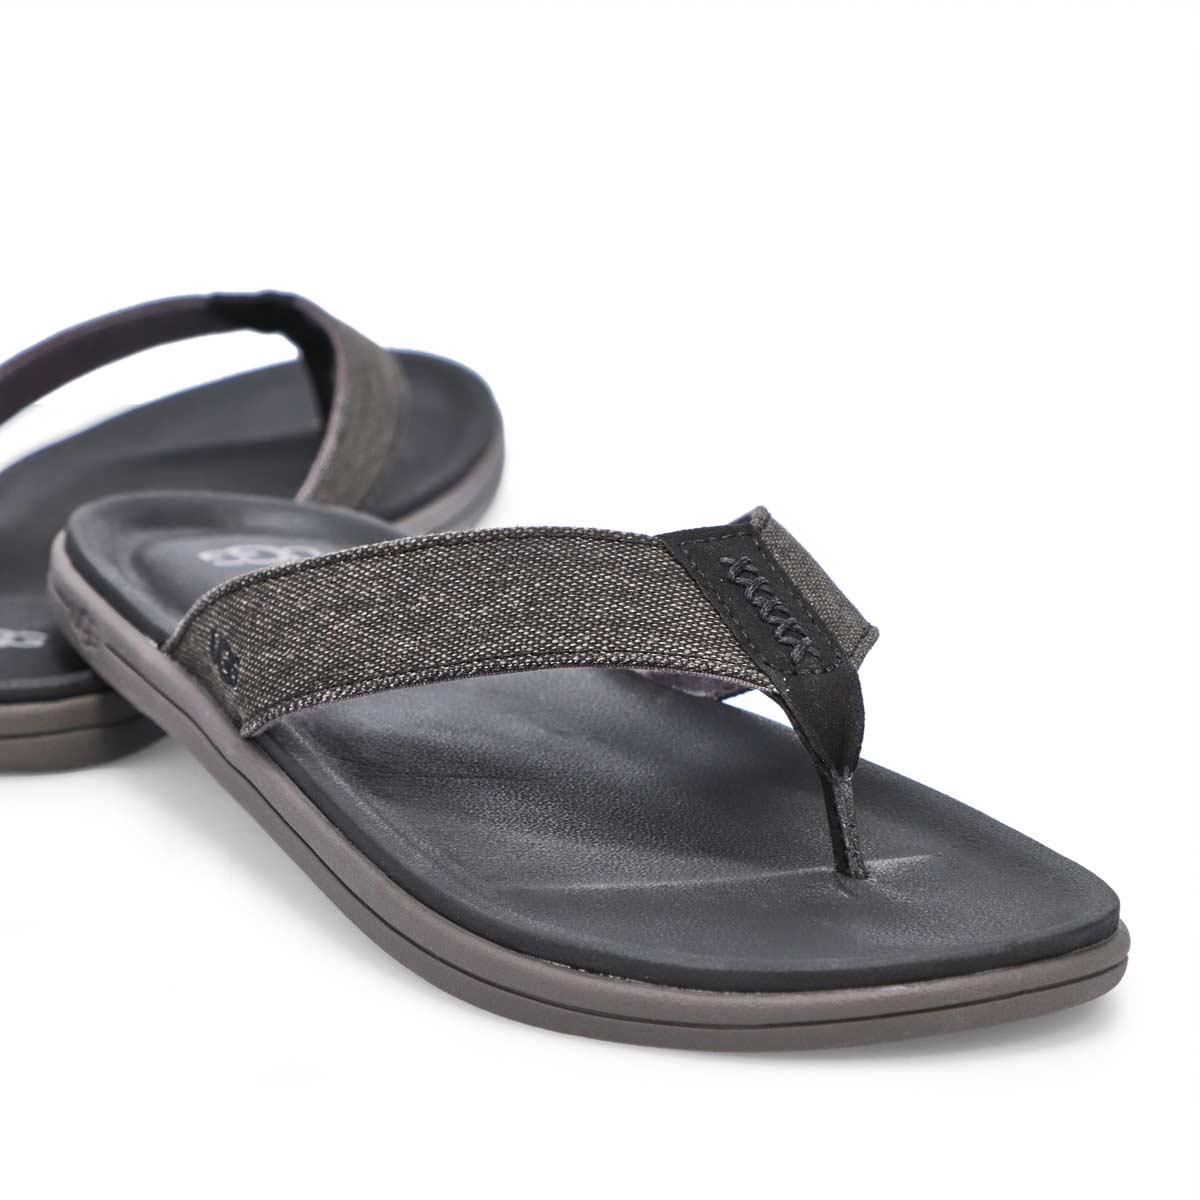 Men's Brookside Flip Thong Sandal - Black